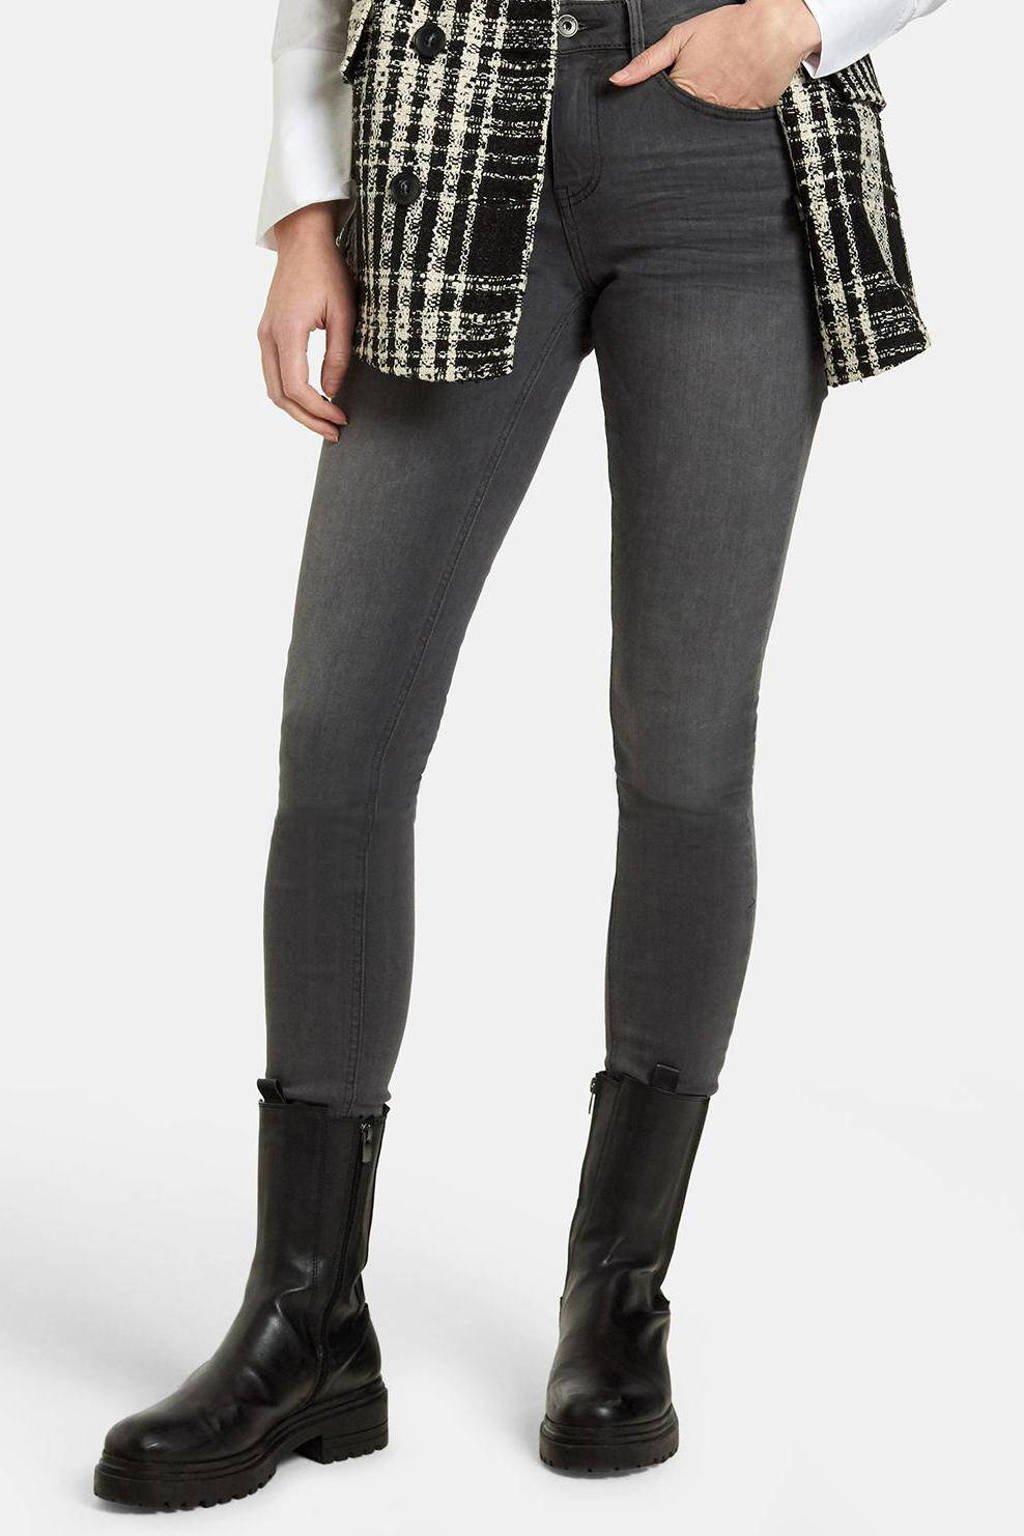 Eksept by Shoeby high waist skinny jeans Liza Edith L34 grijs, Grijs